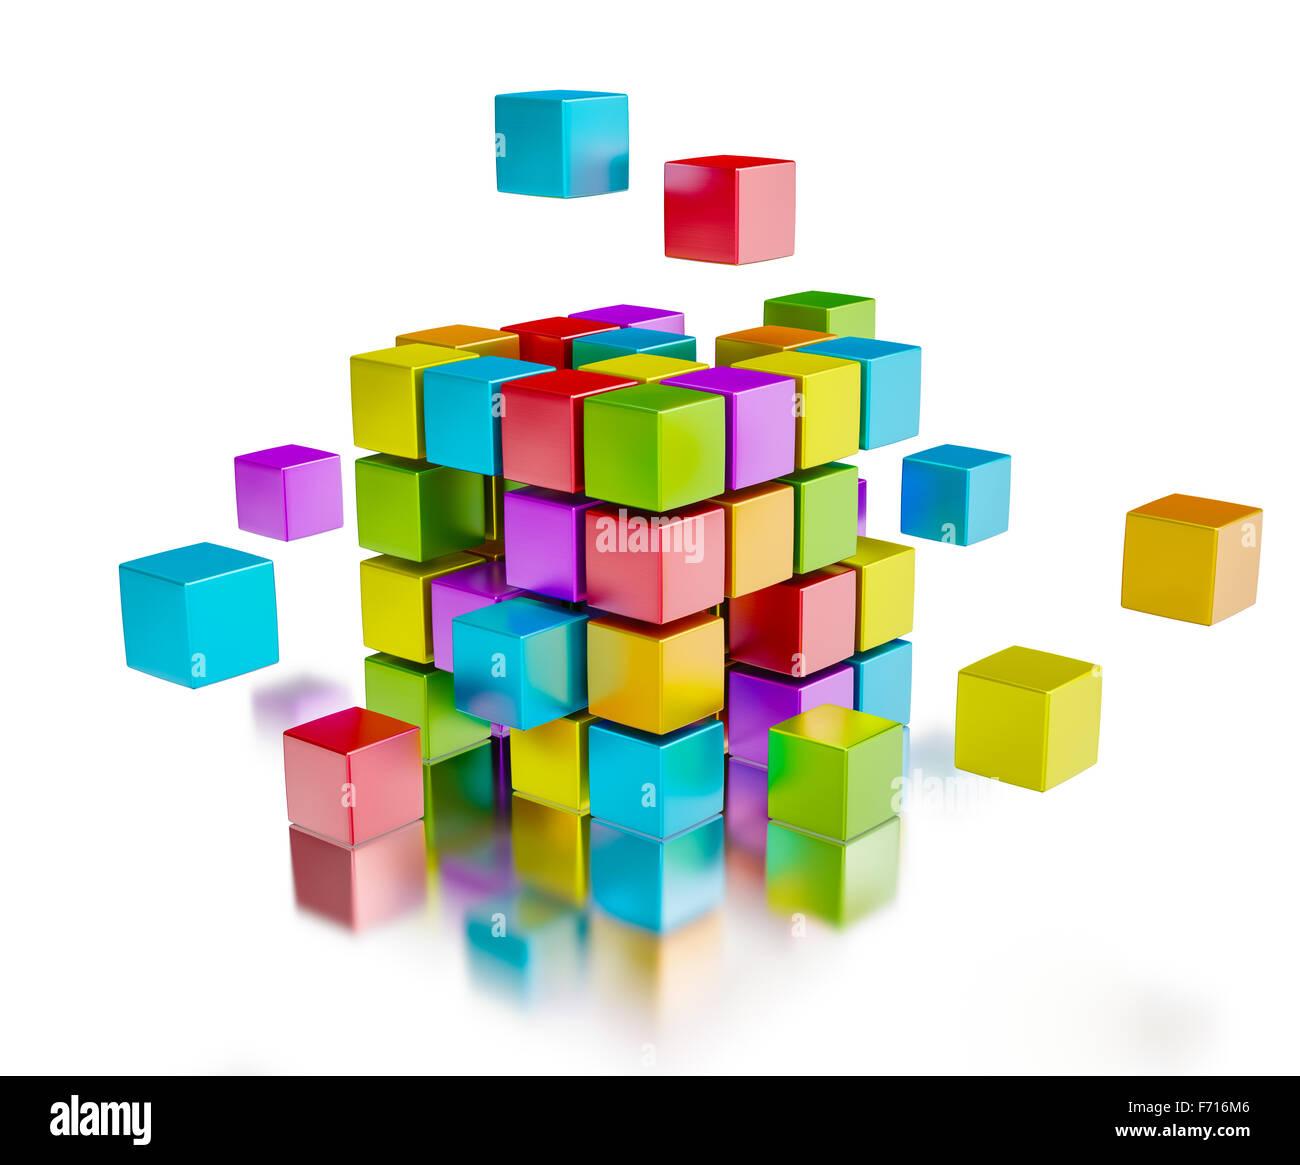 Business-Teamarbeit-Internet-Kommunikations-Konzept Stockbild